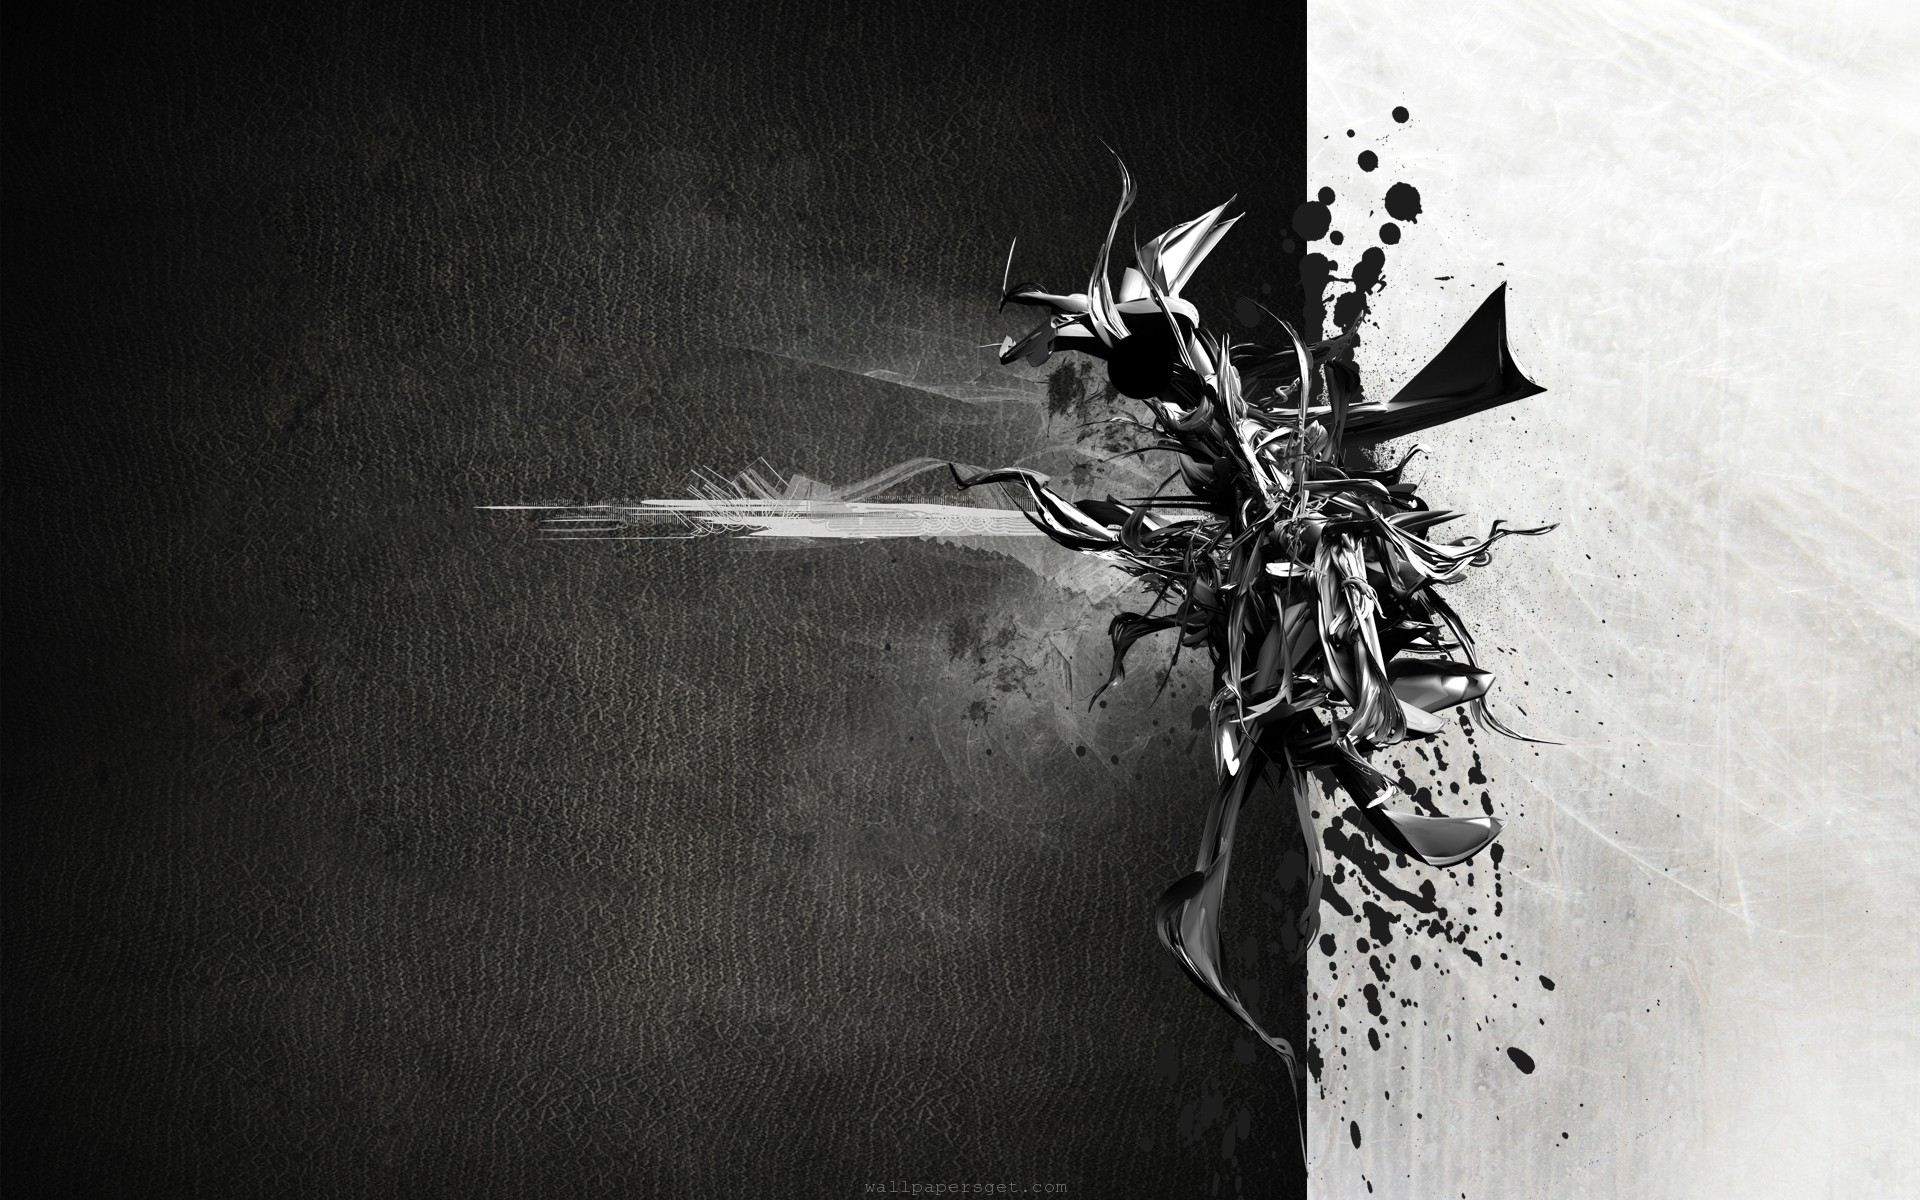 Black Abstract Wallpaper HD - WallpaperSafari